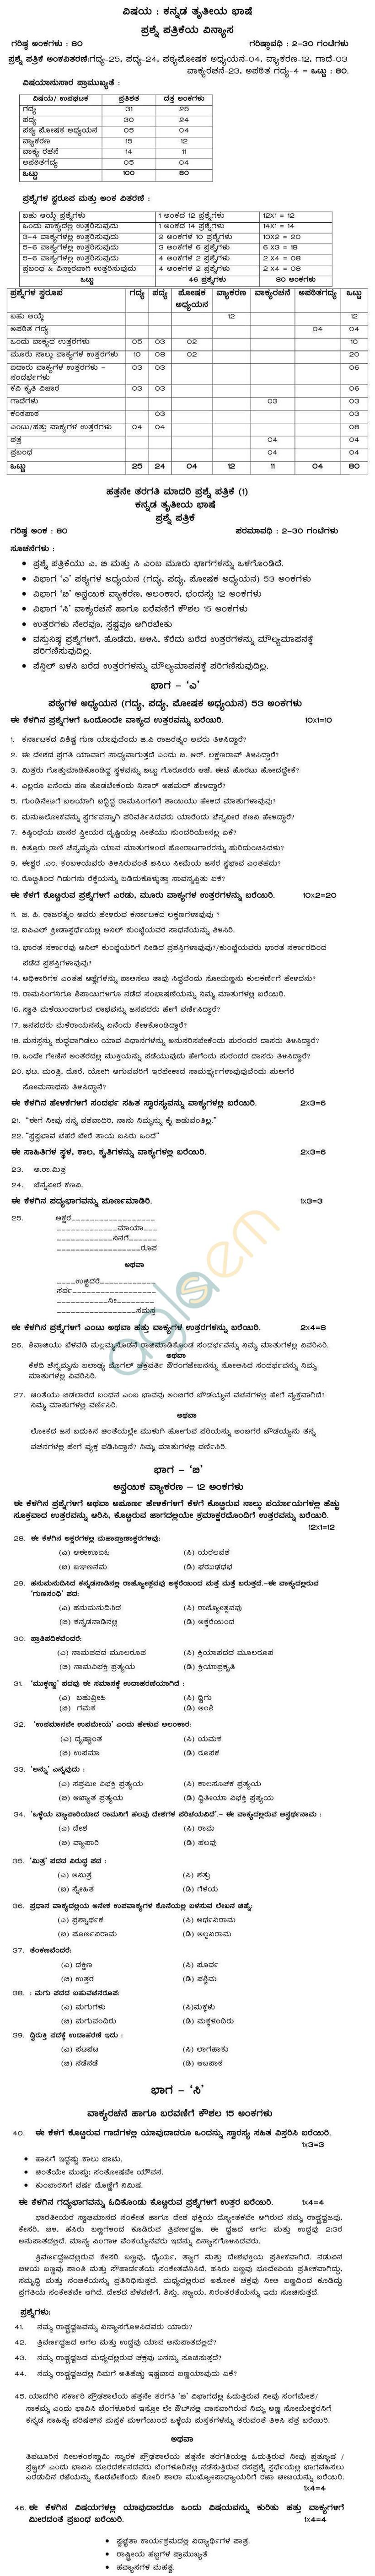 Karnataka Board SSLC Model Question Papers 2015 forKannada (III)